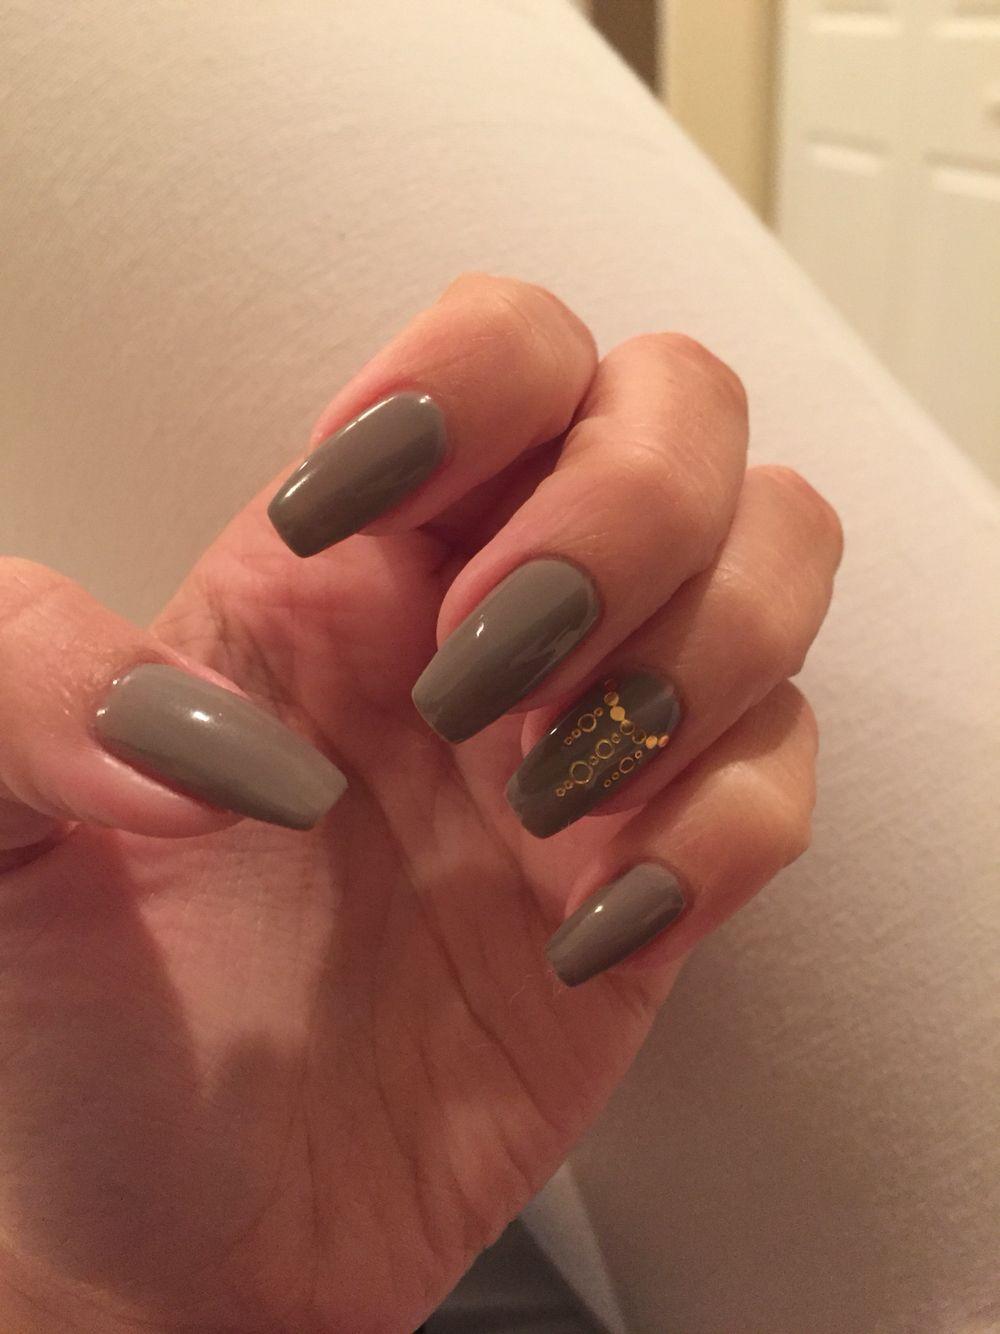 Wood lake DD gel nails | Nail art | Pinterest | Face skin